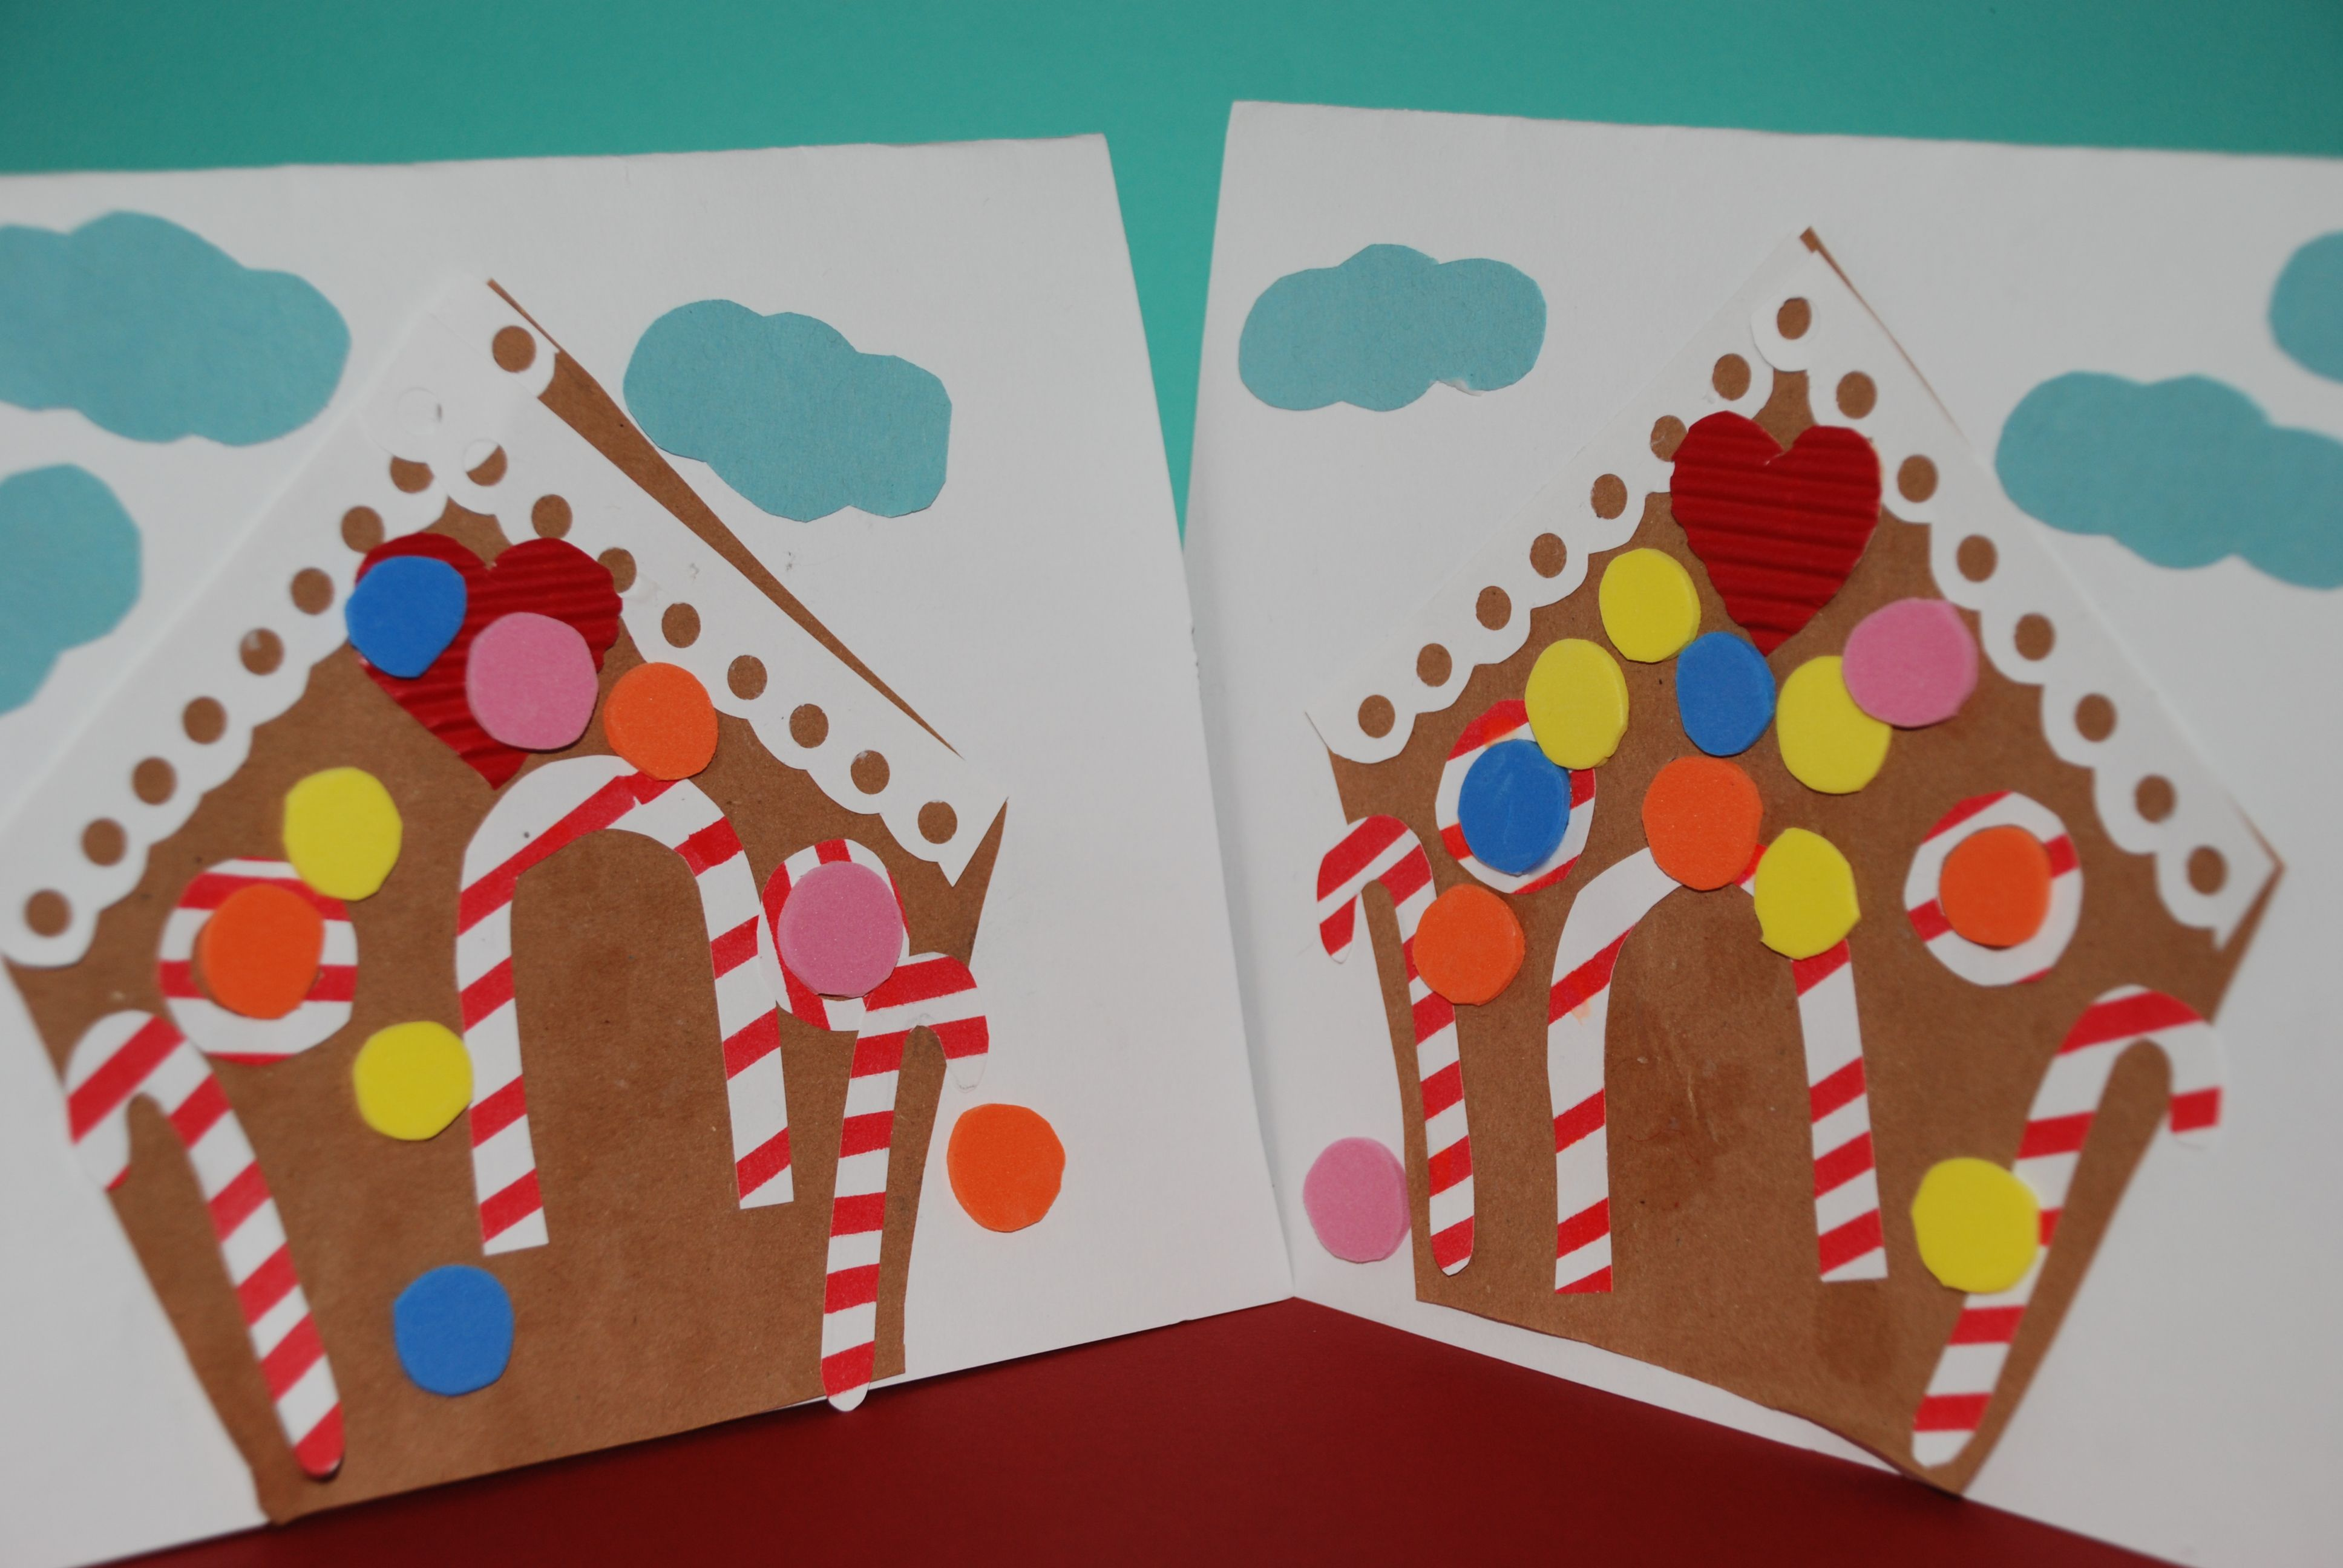 Gingerbread house cards 2 house cards gingerbread and house gingerbread house cards 2 crafts for preschoolerskids kristyandbryce Gallery